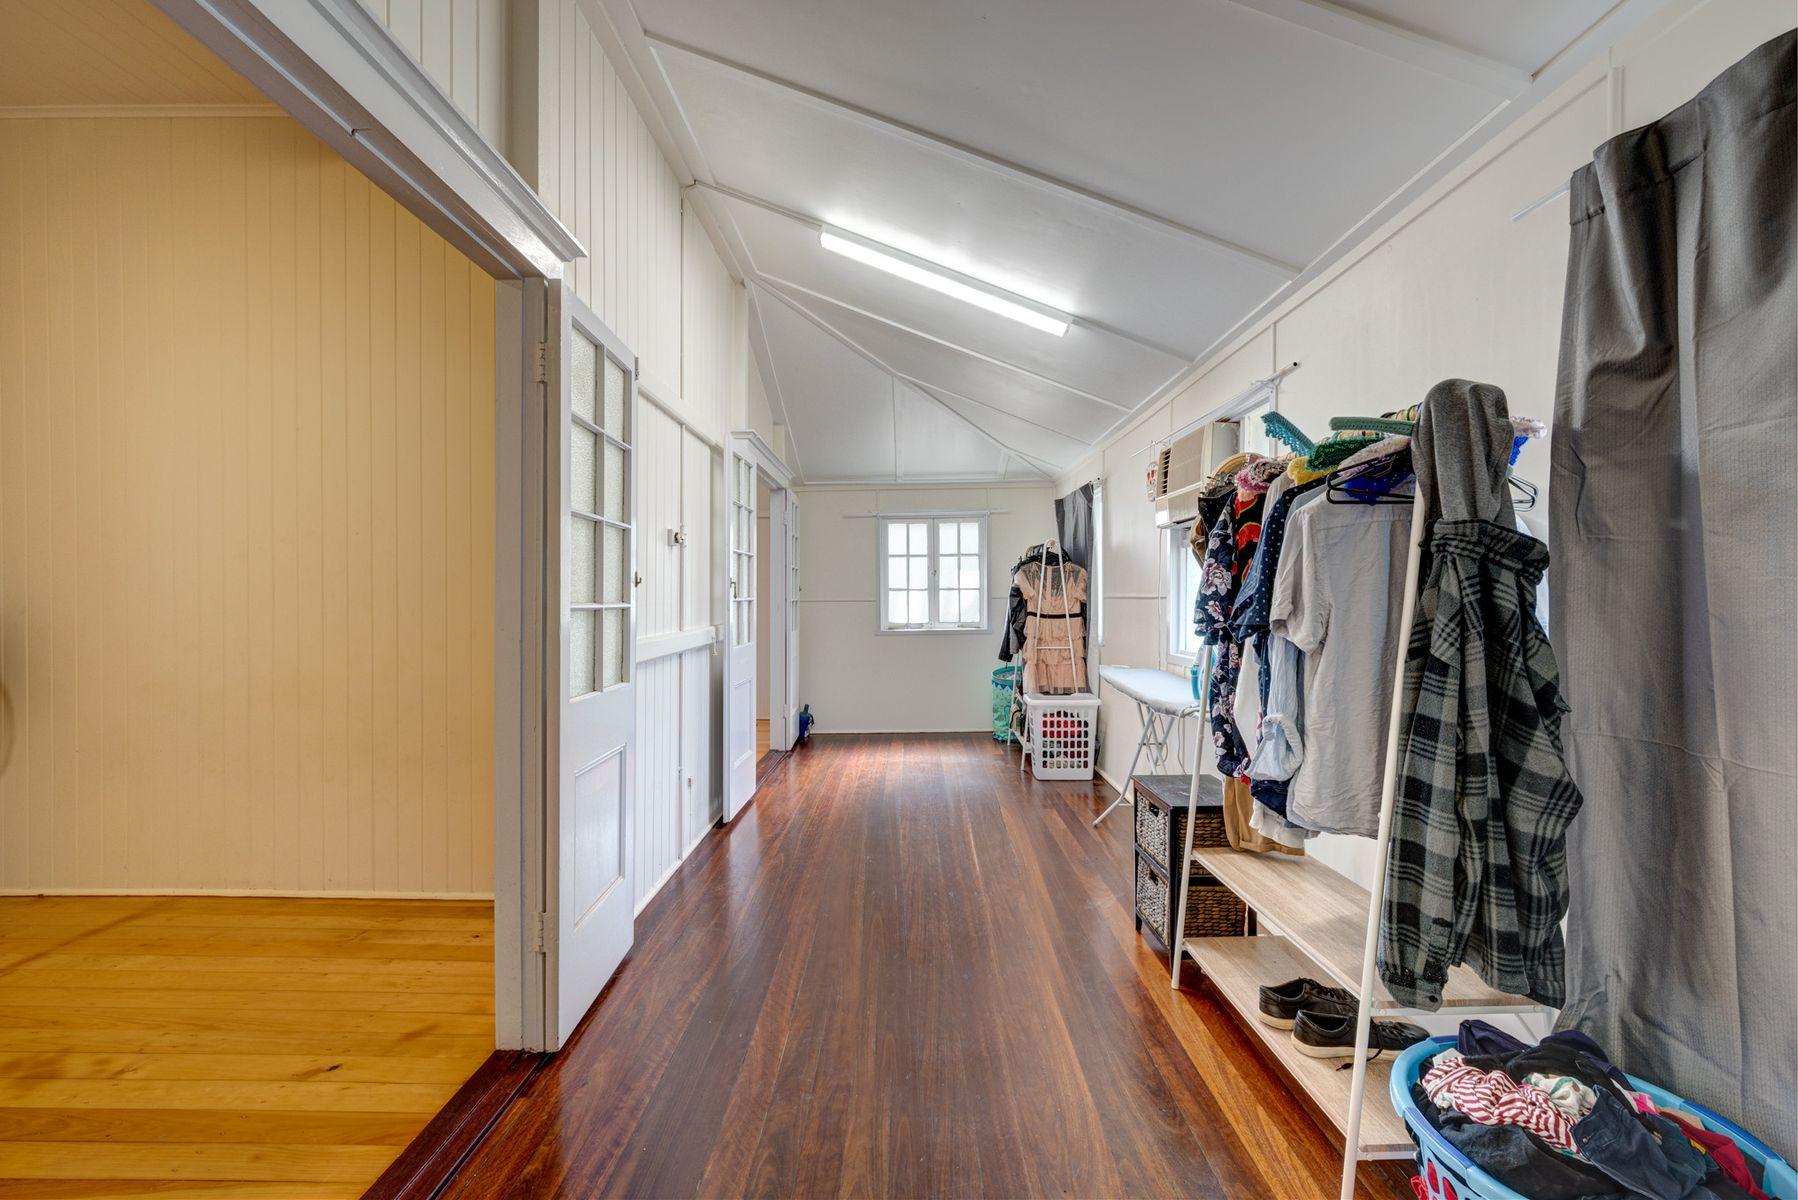 142 Woondooma Street, Bundaberg West, QLD 4670